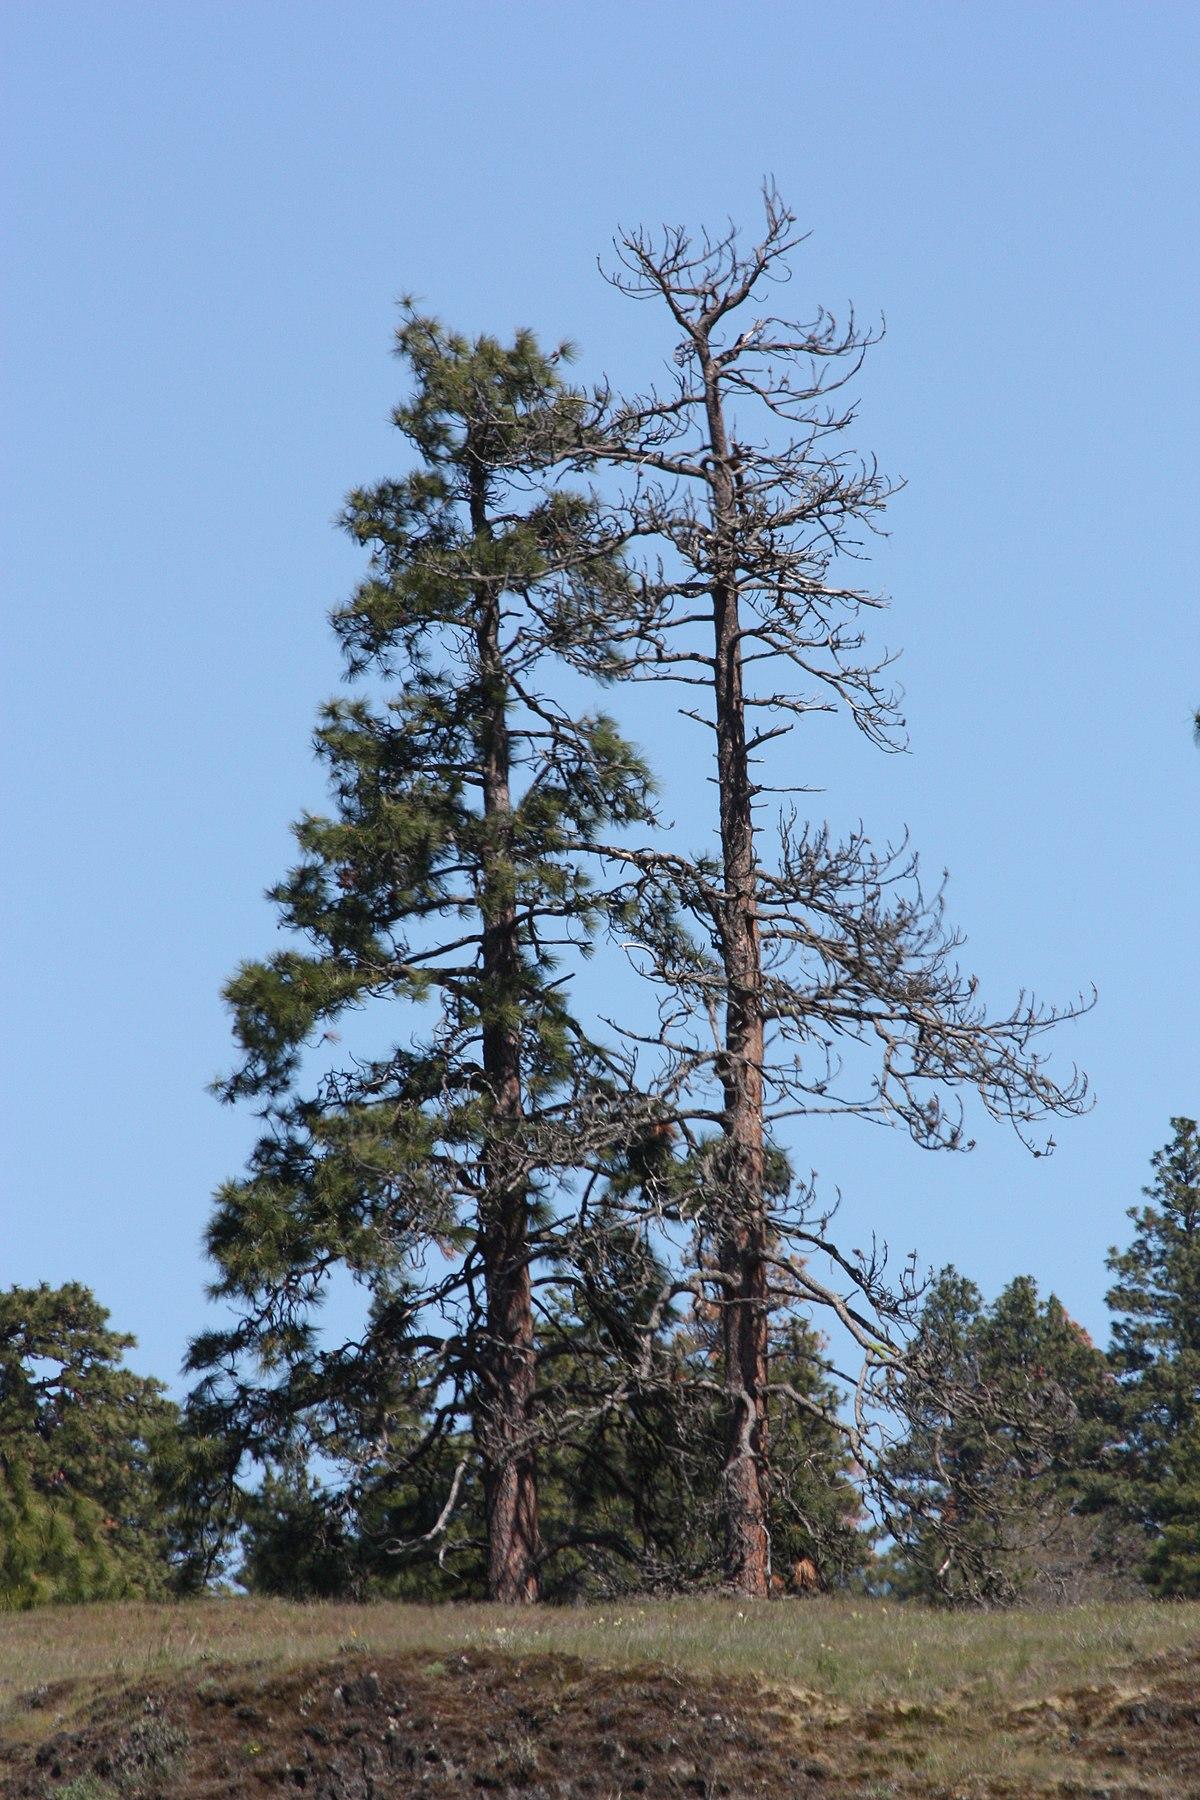 Ponderosa Pine Tree Images Pinus ponderosa - Wiki...